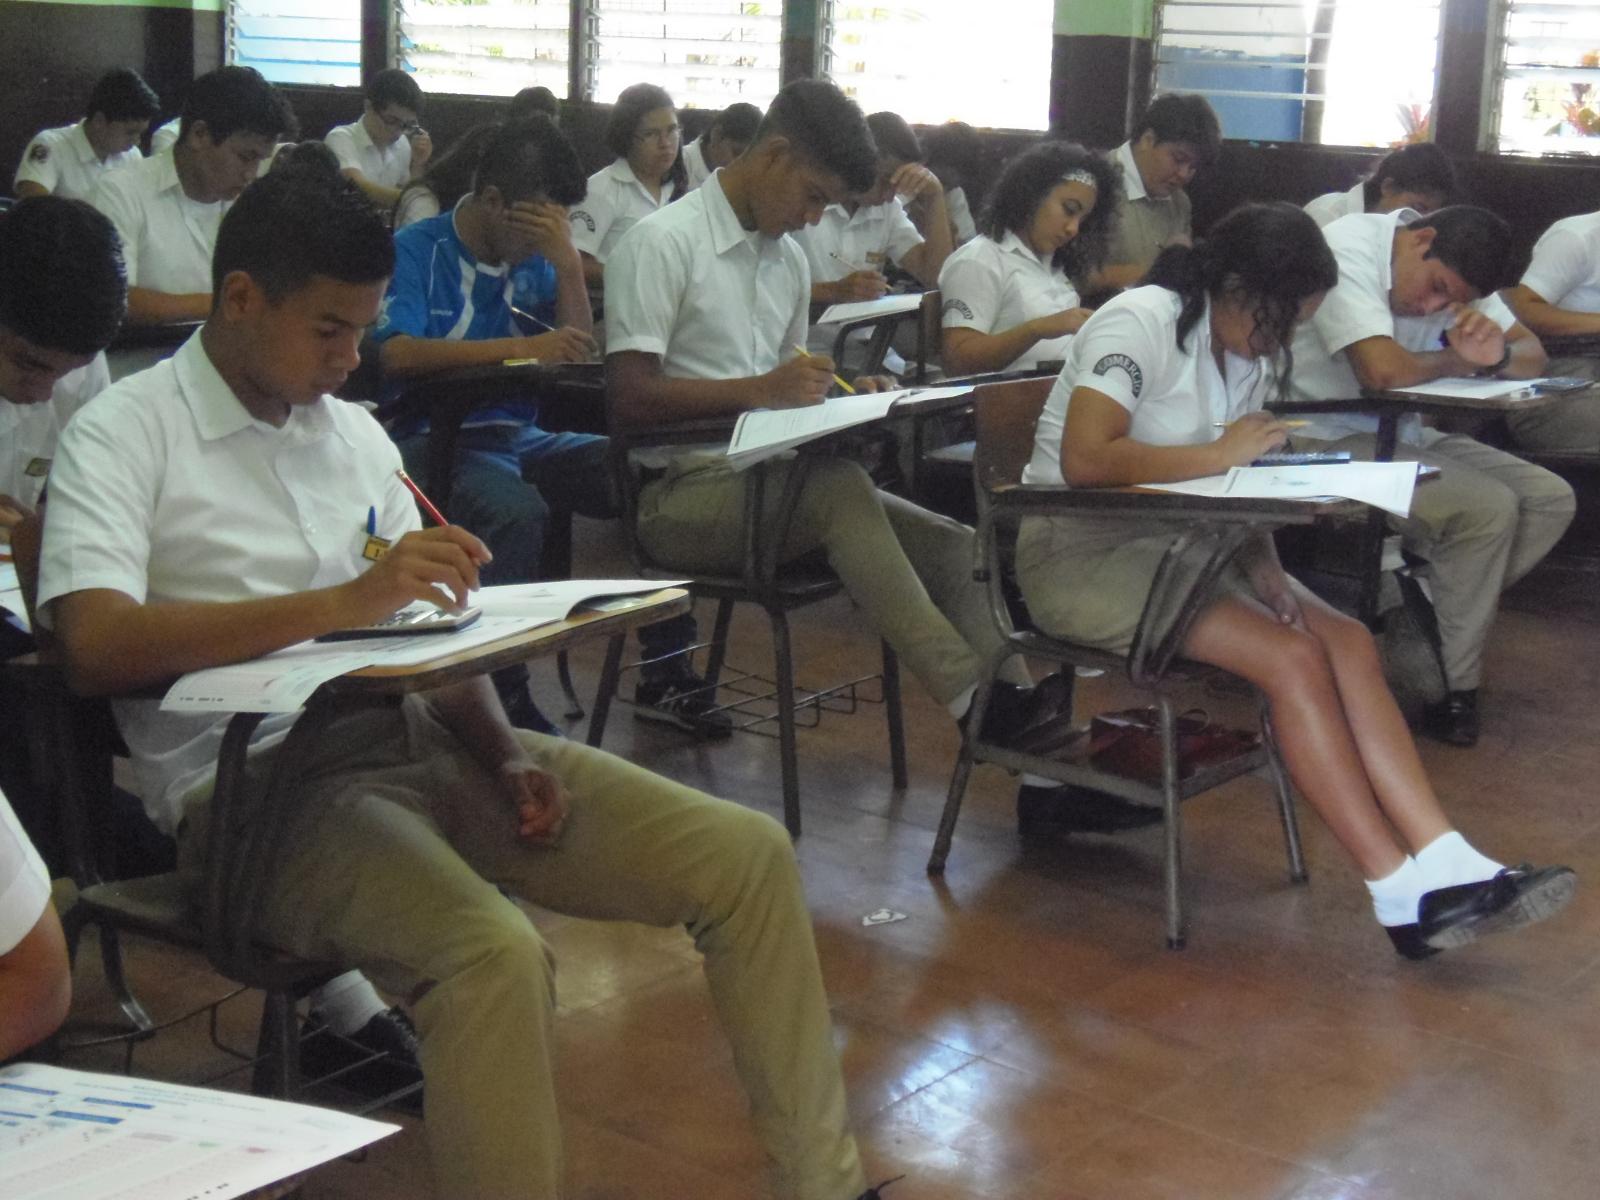 6,710 alumnos se someten a la PAES en Santa Ana